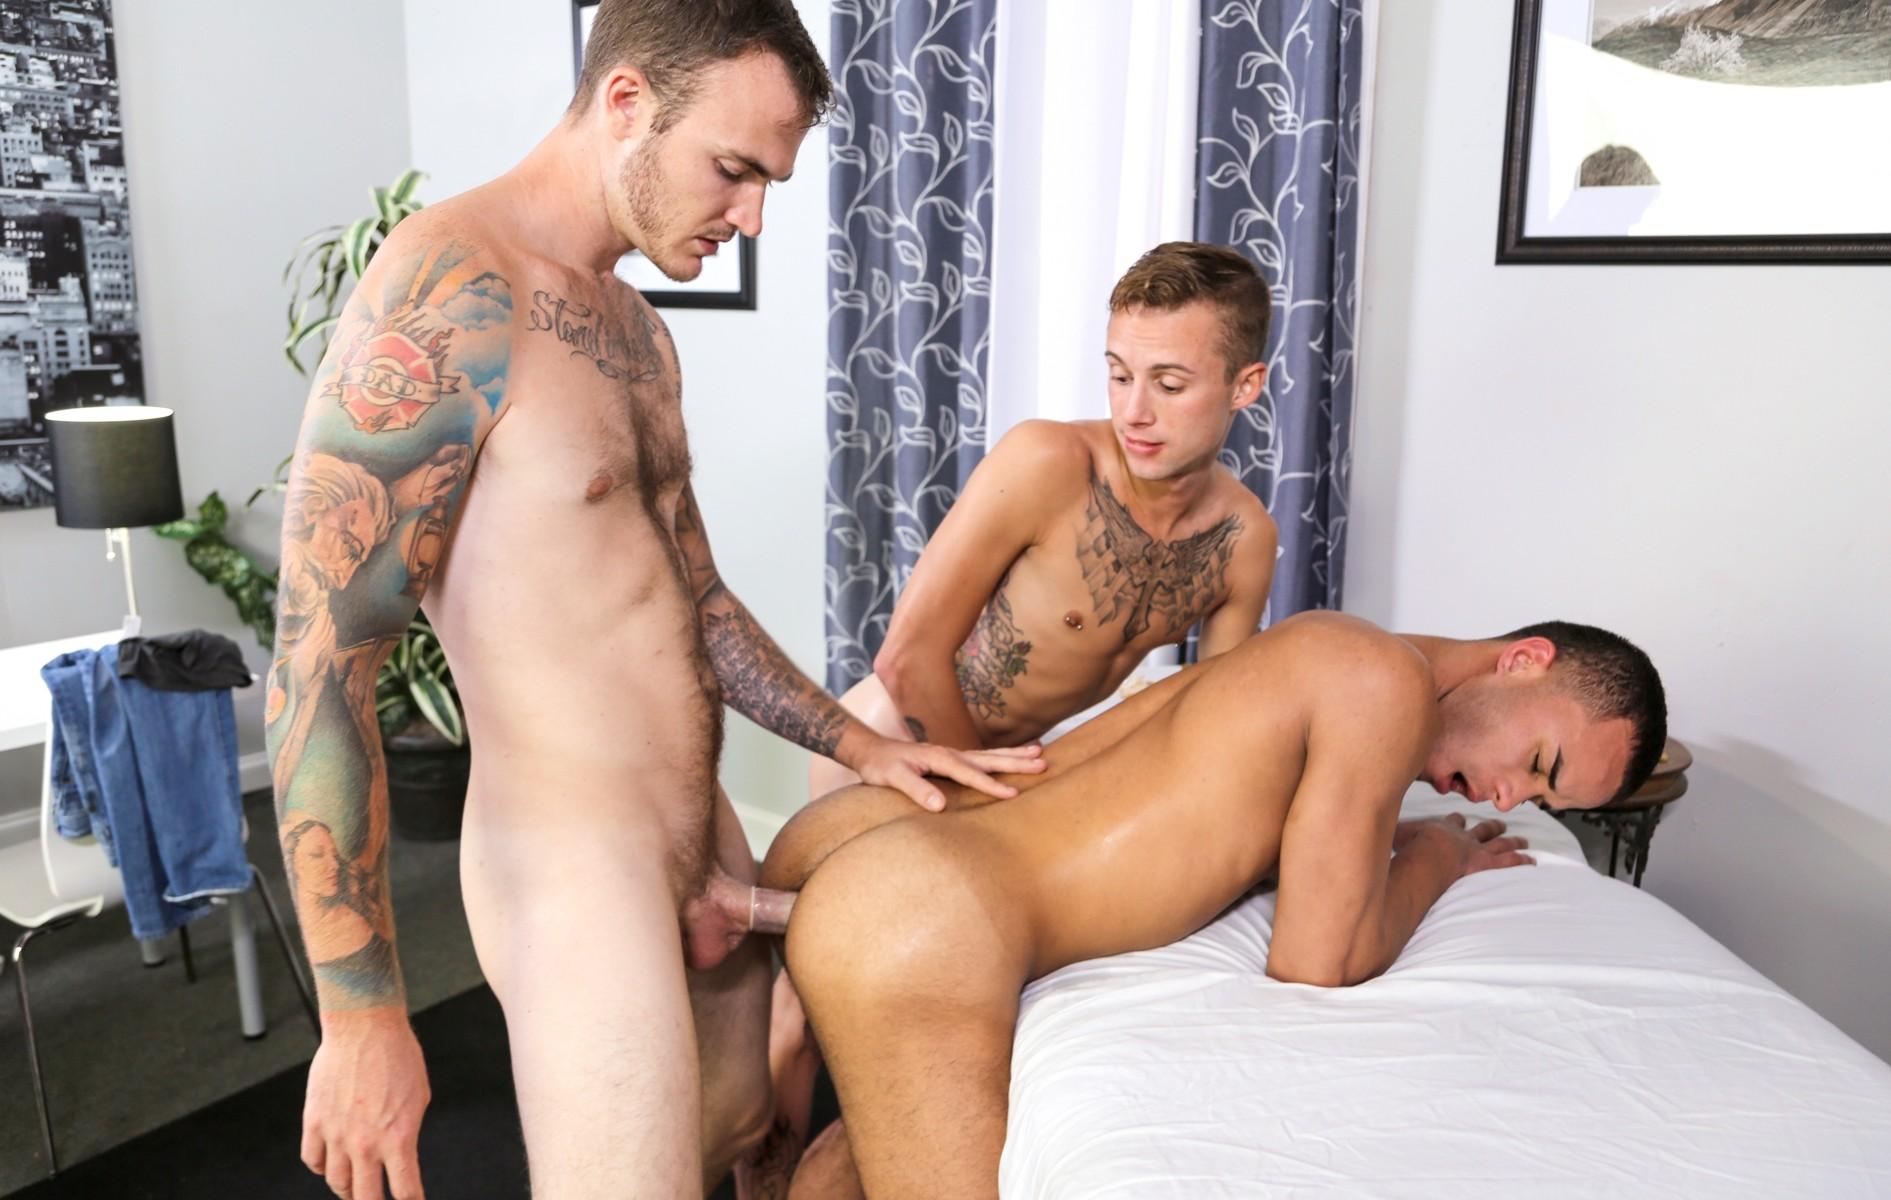 Christian Wilde, Javier Cruz and Sean Christopher